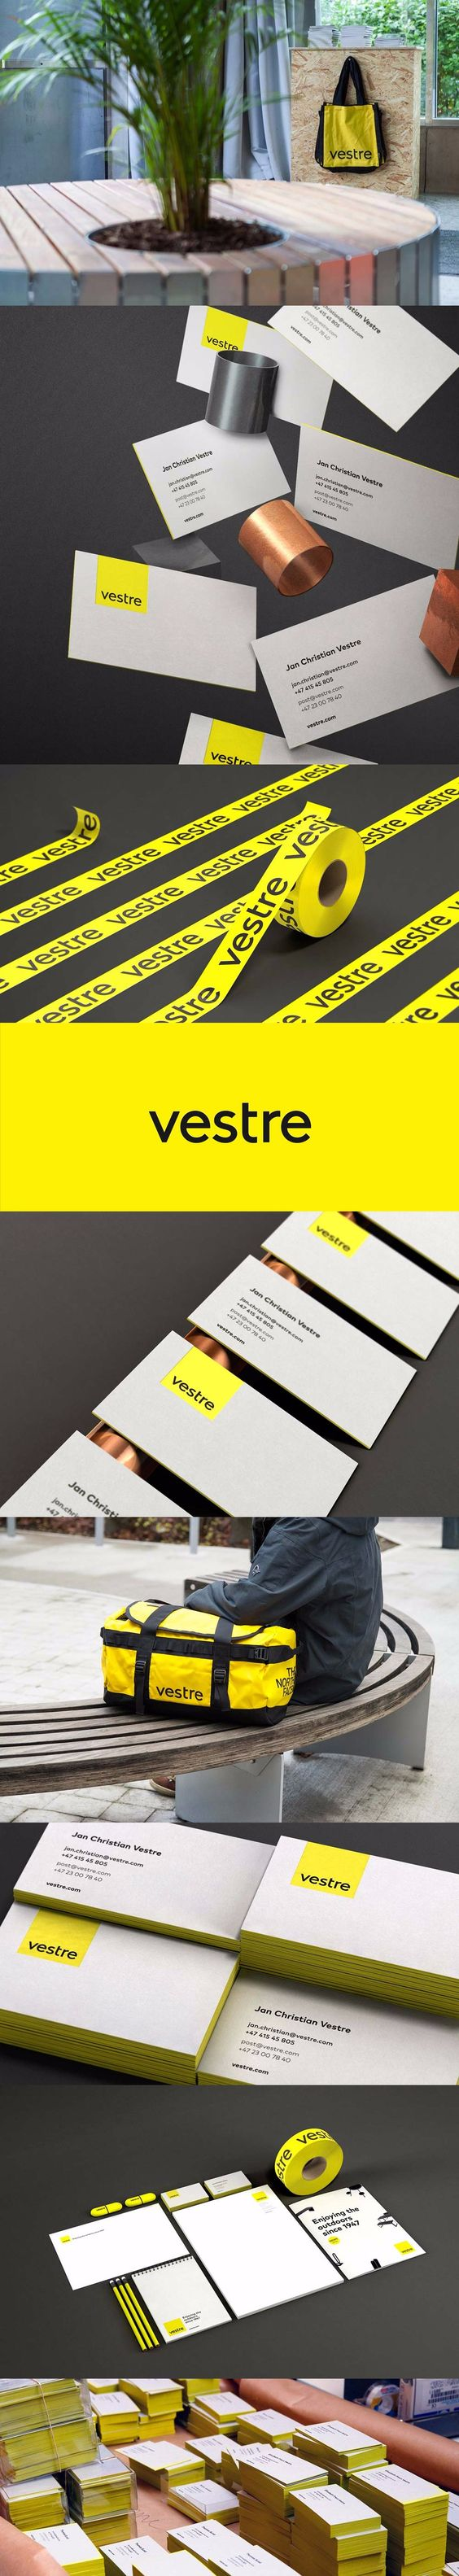 9 best SMELLS LIKE SPELLS images on Pinterest   Design packaging ...